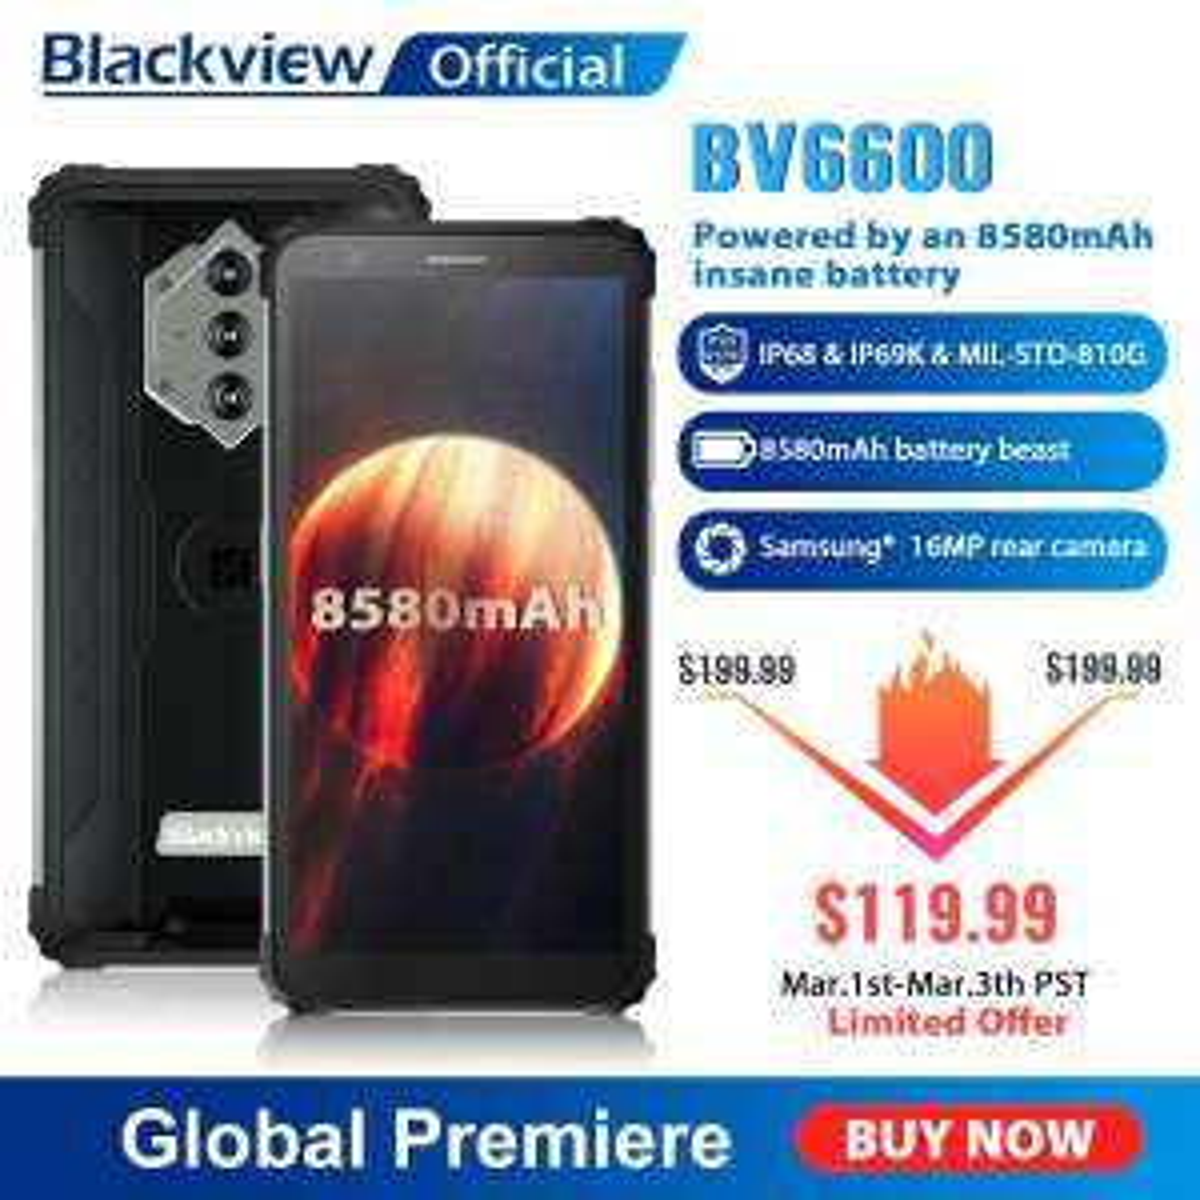 Pancerny Smartphone Blackview BV6600 4/64GB 8580 mAh IP68 IP69 - $119.99